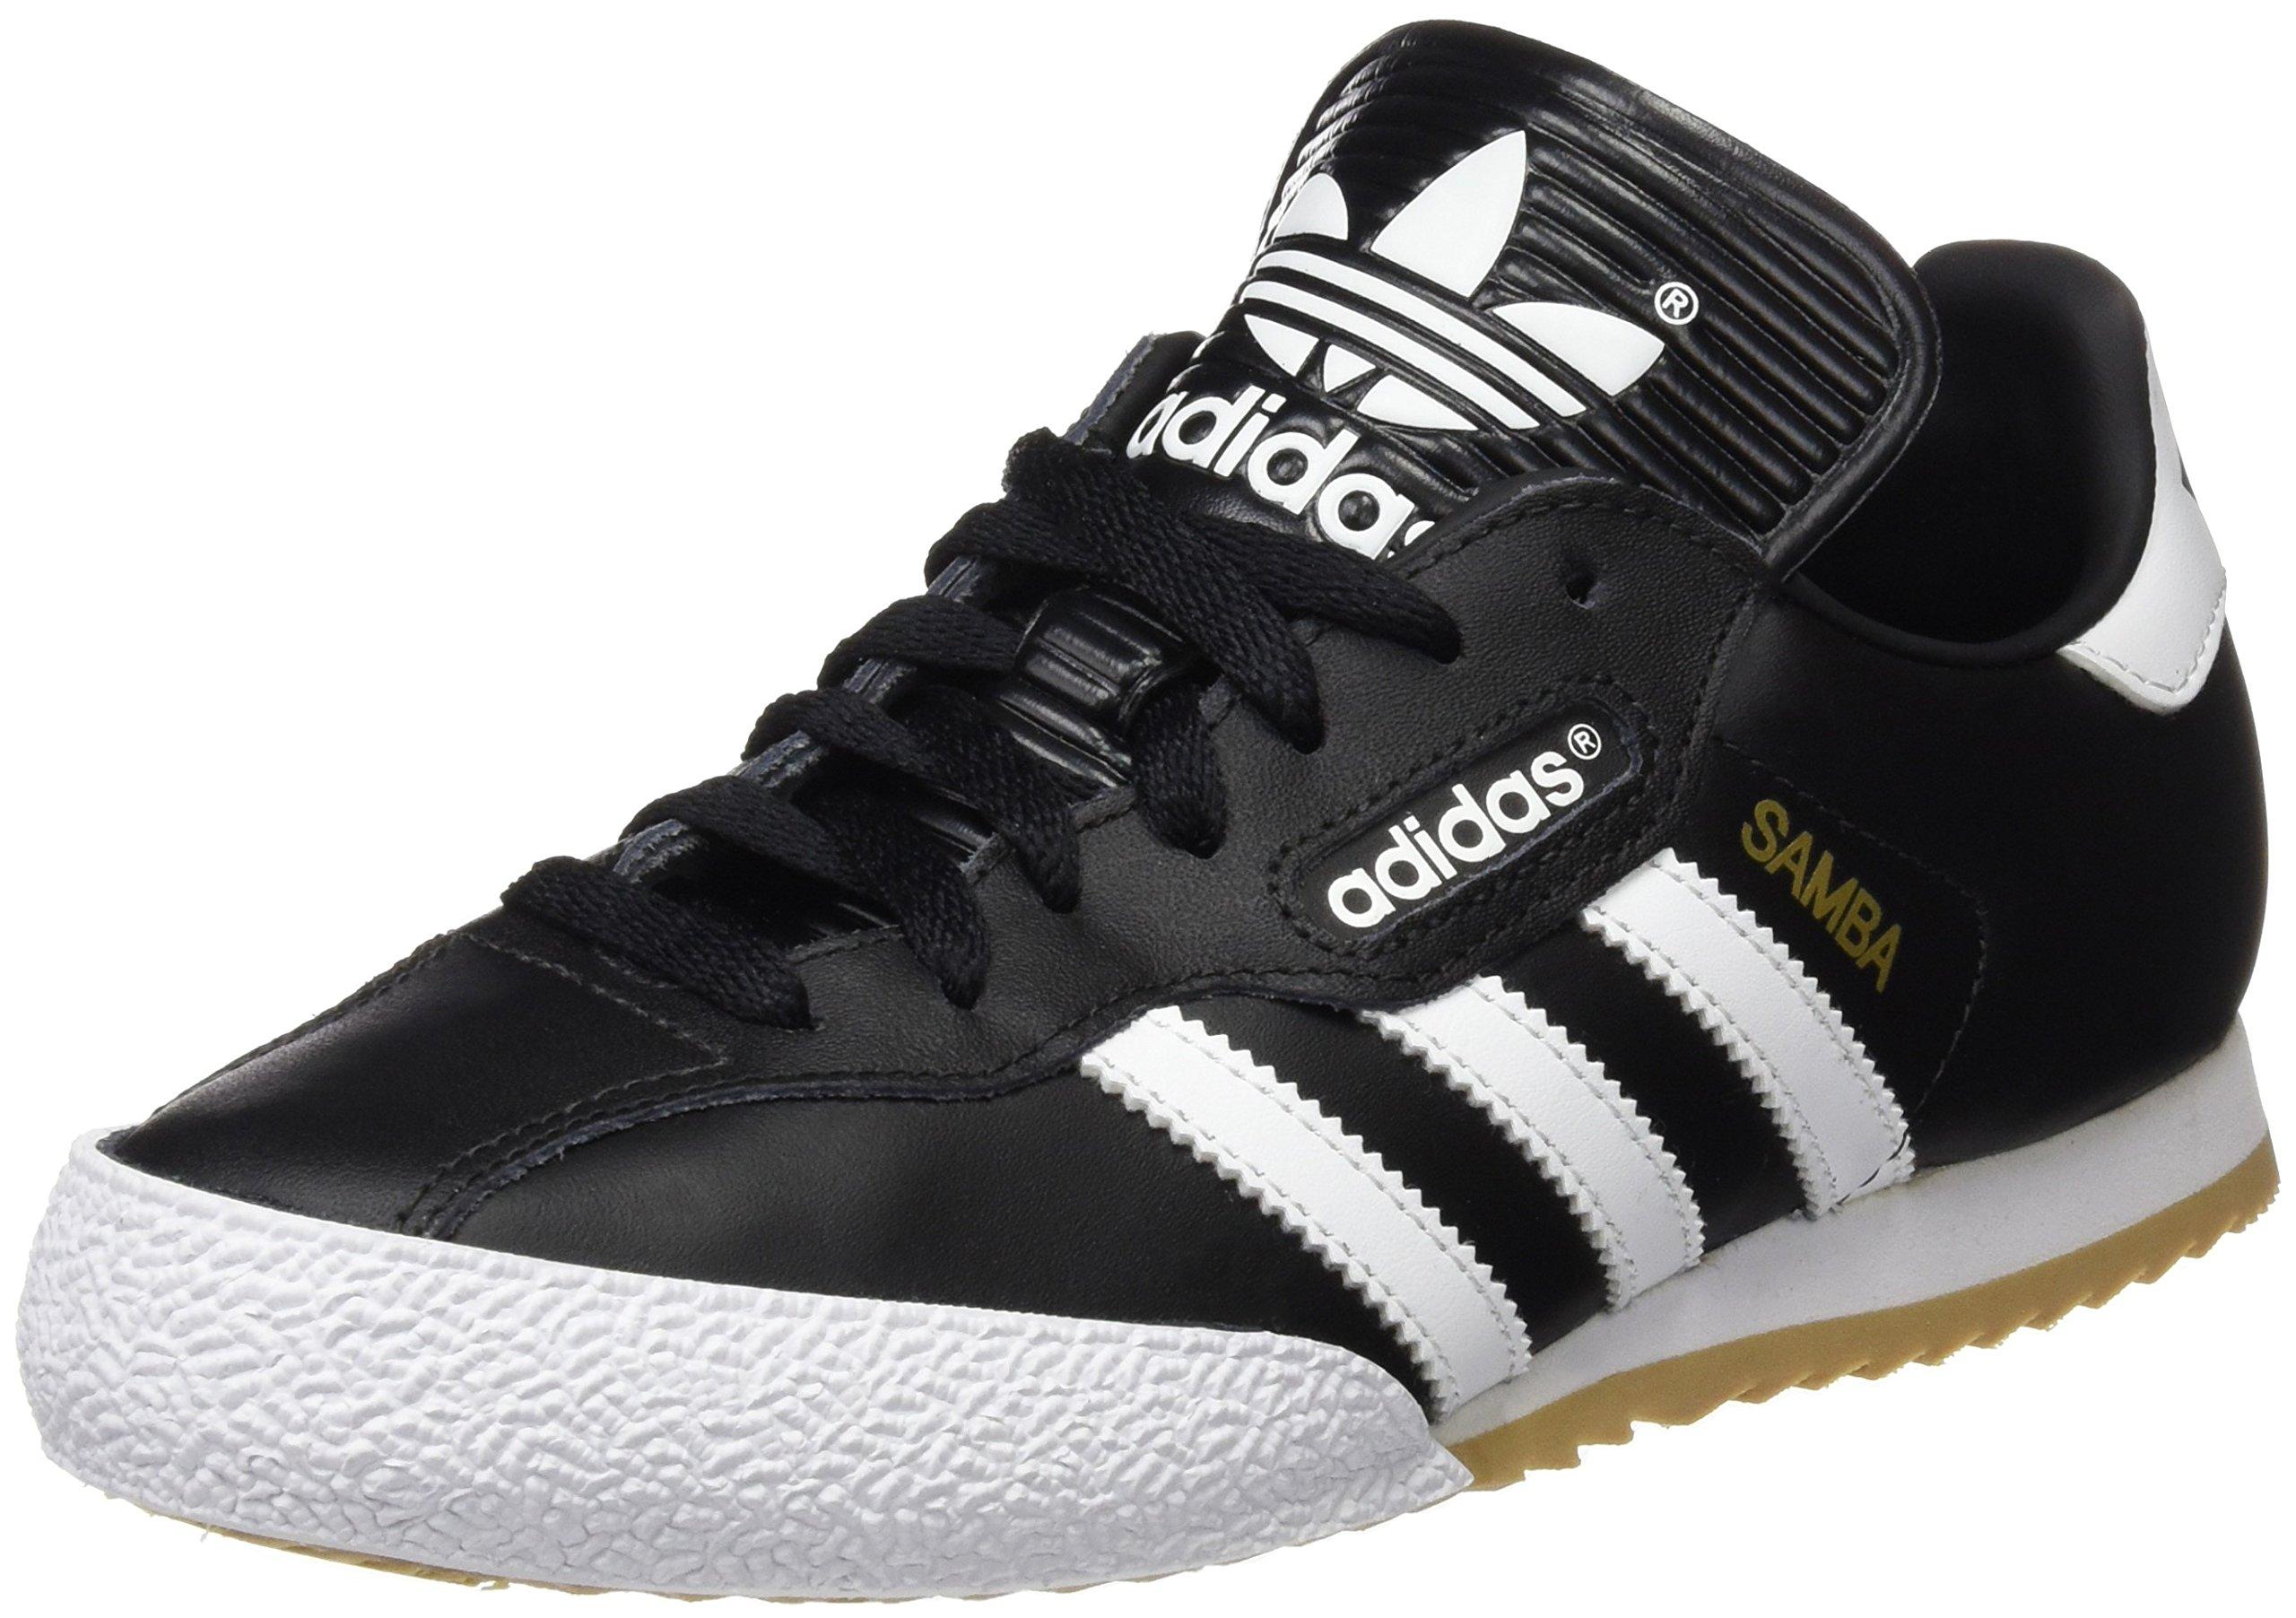 adidas Men's Samba Super Fitness Shoes